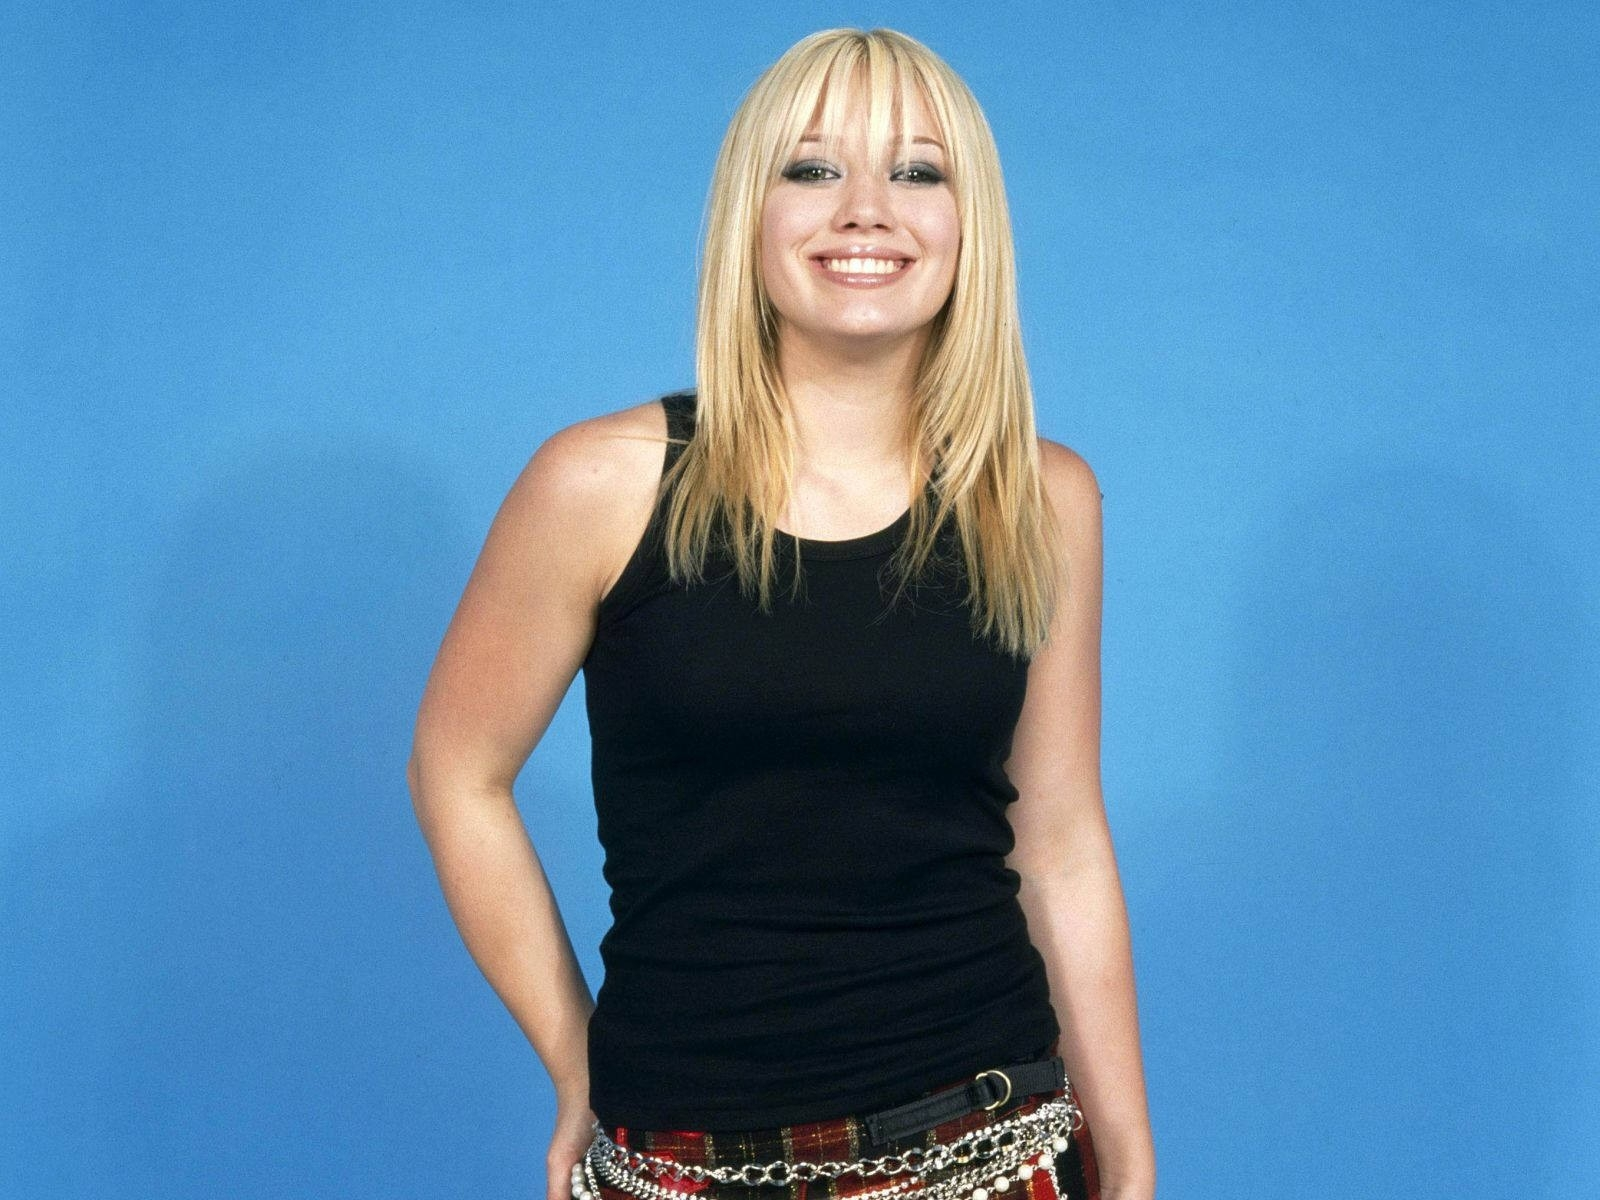 Wallpaper di Hilary Duff - 57